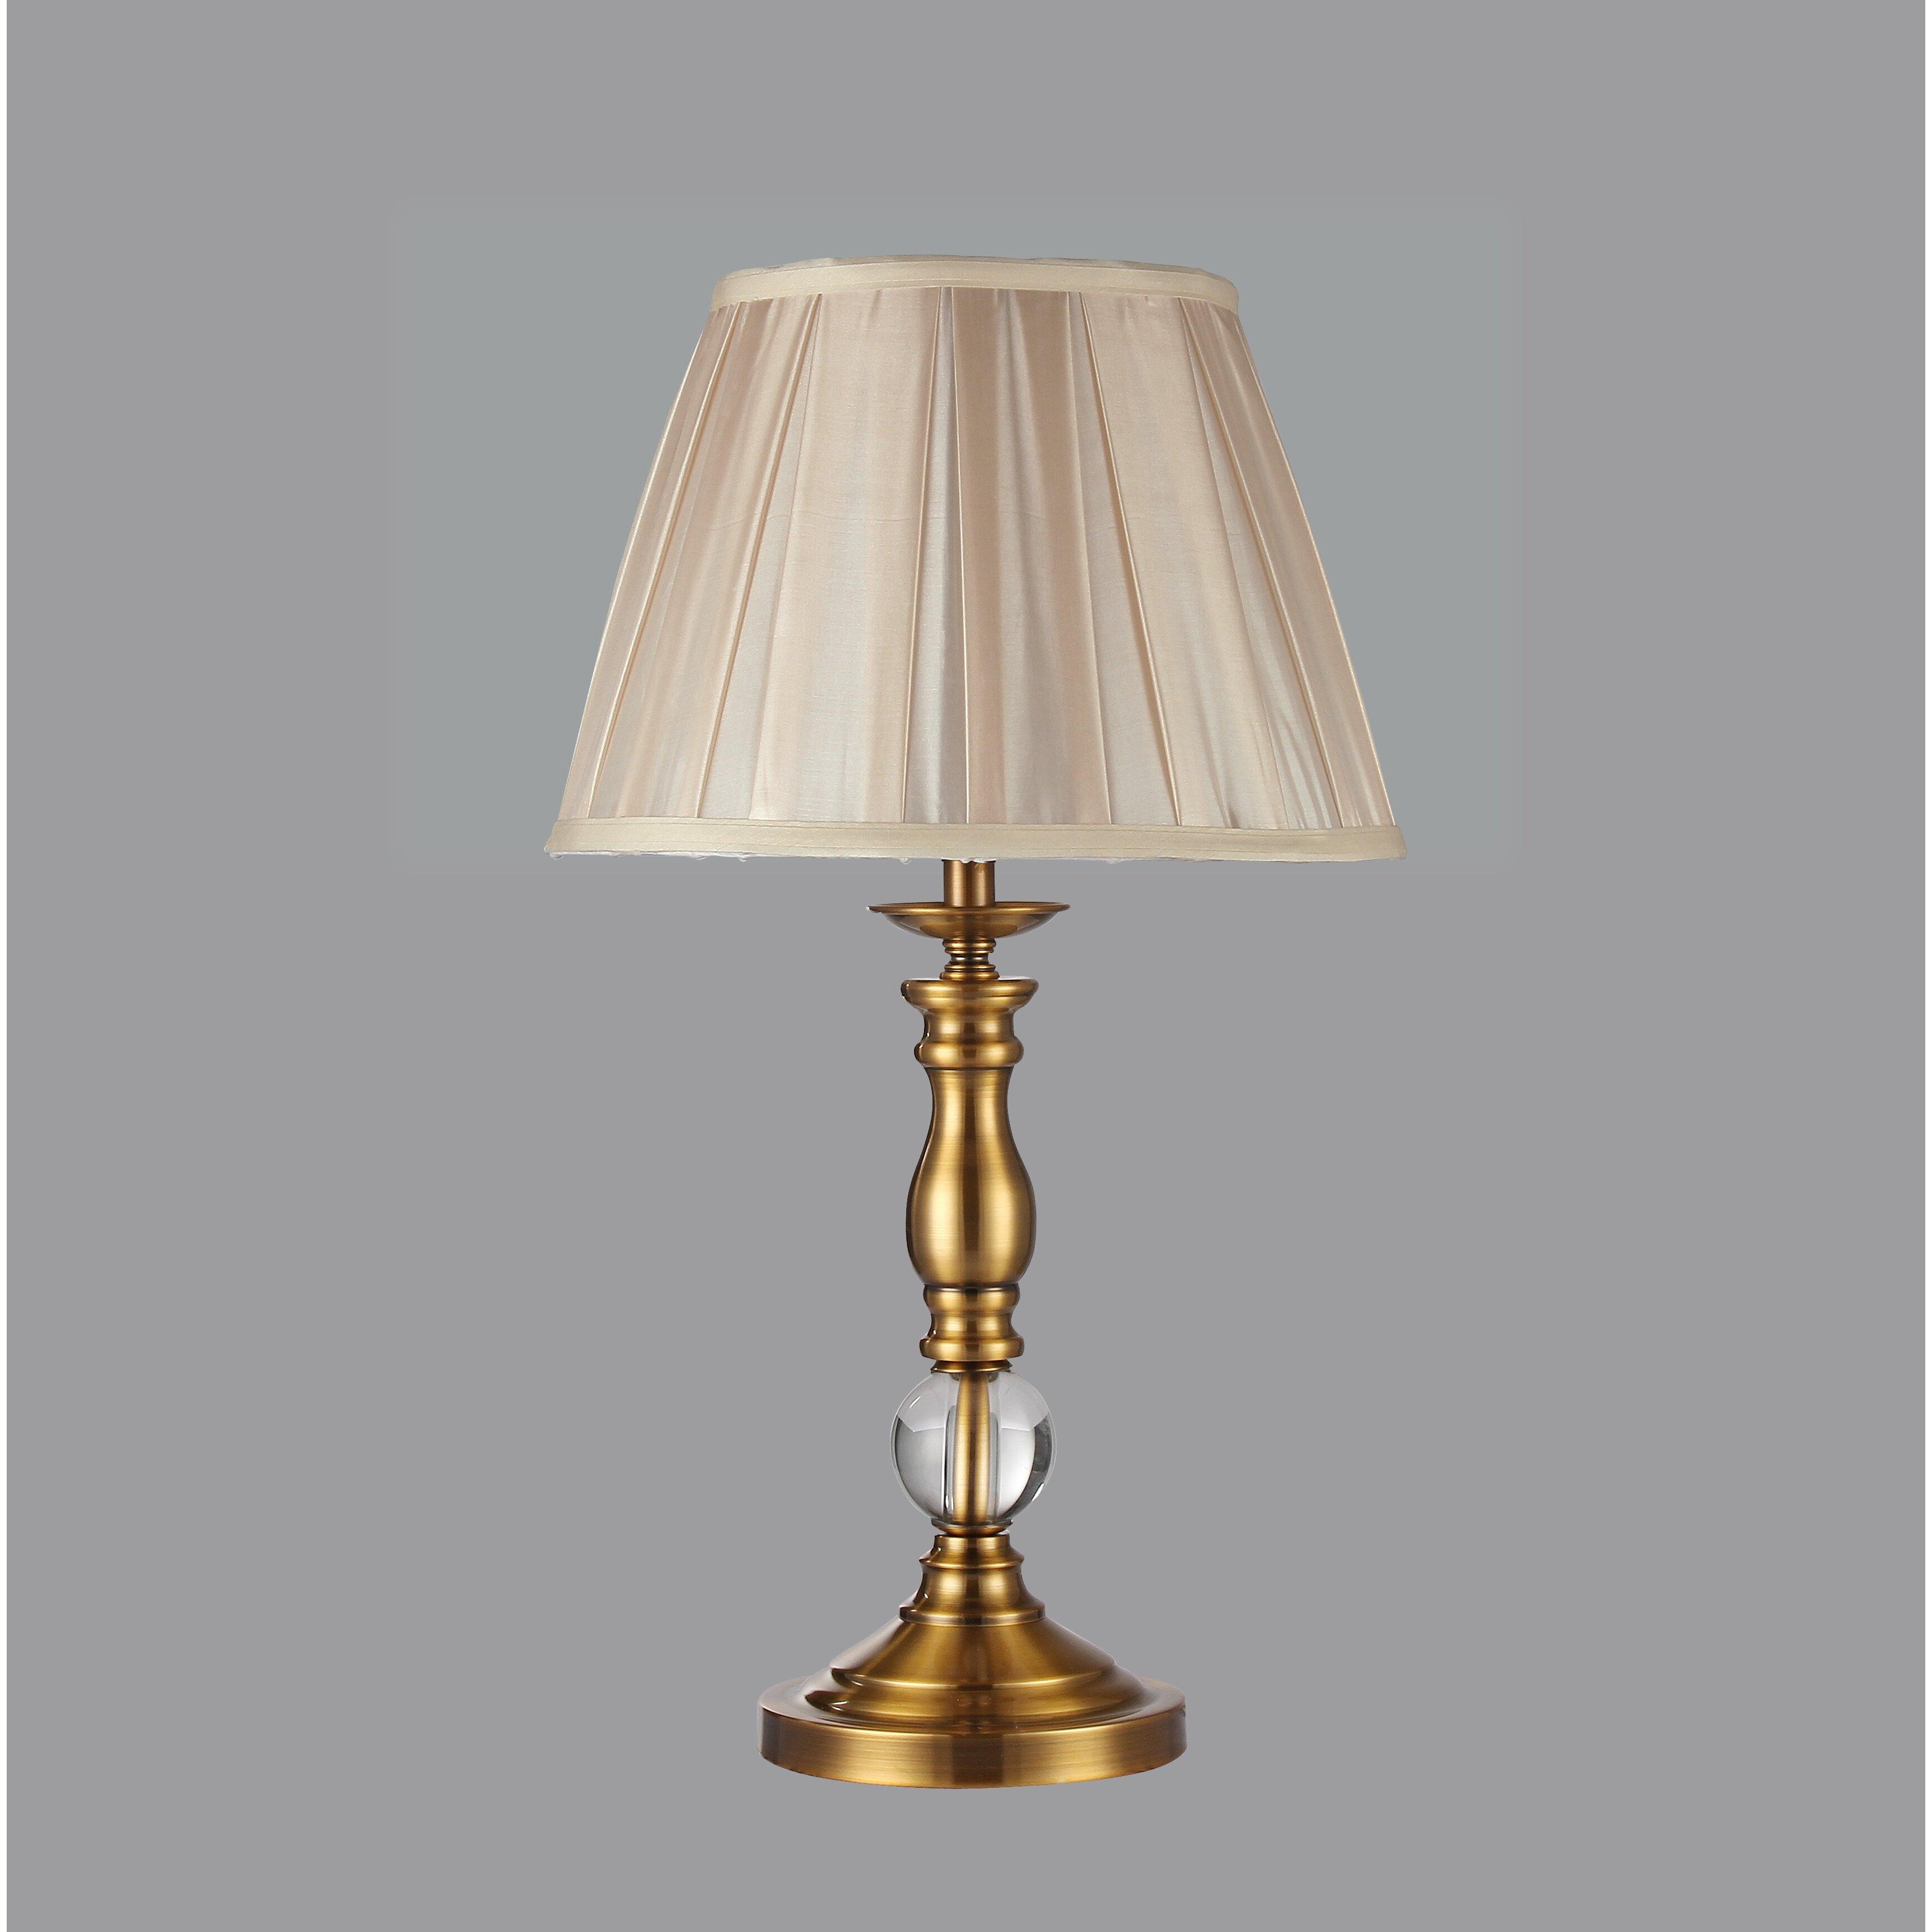 warehouse of tiffany fabianne 20 table lamp wayfair. Black Bedroom Furniture Sets. Home Design Ideas